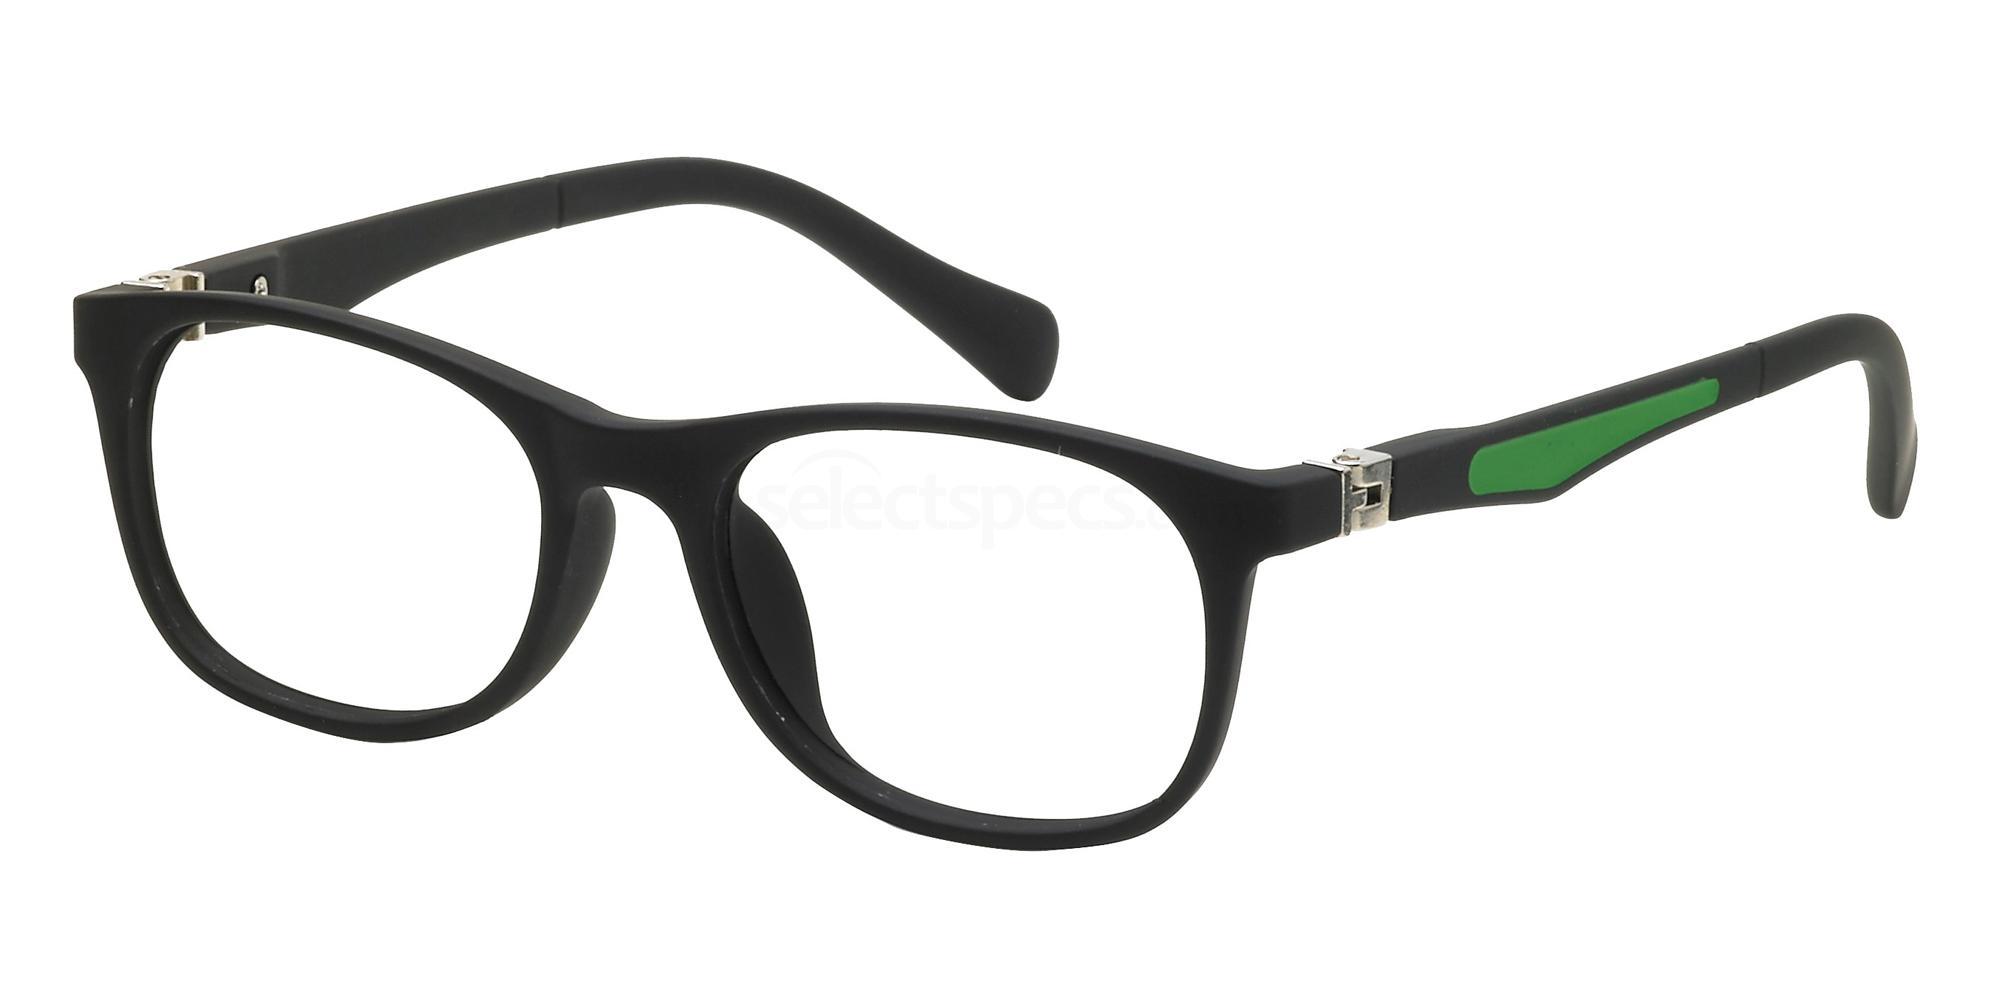 C2 ROCKY4 Glasses, Top Secret KIDS